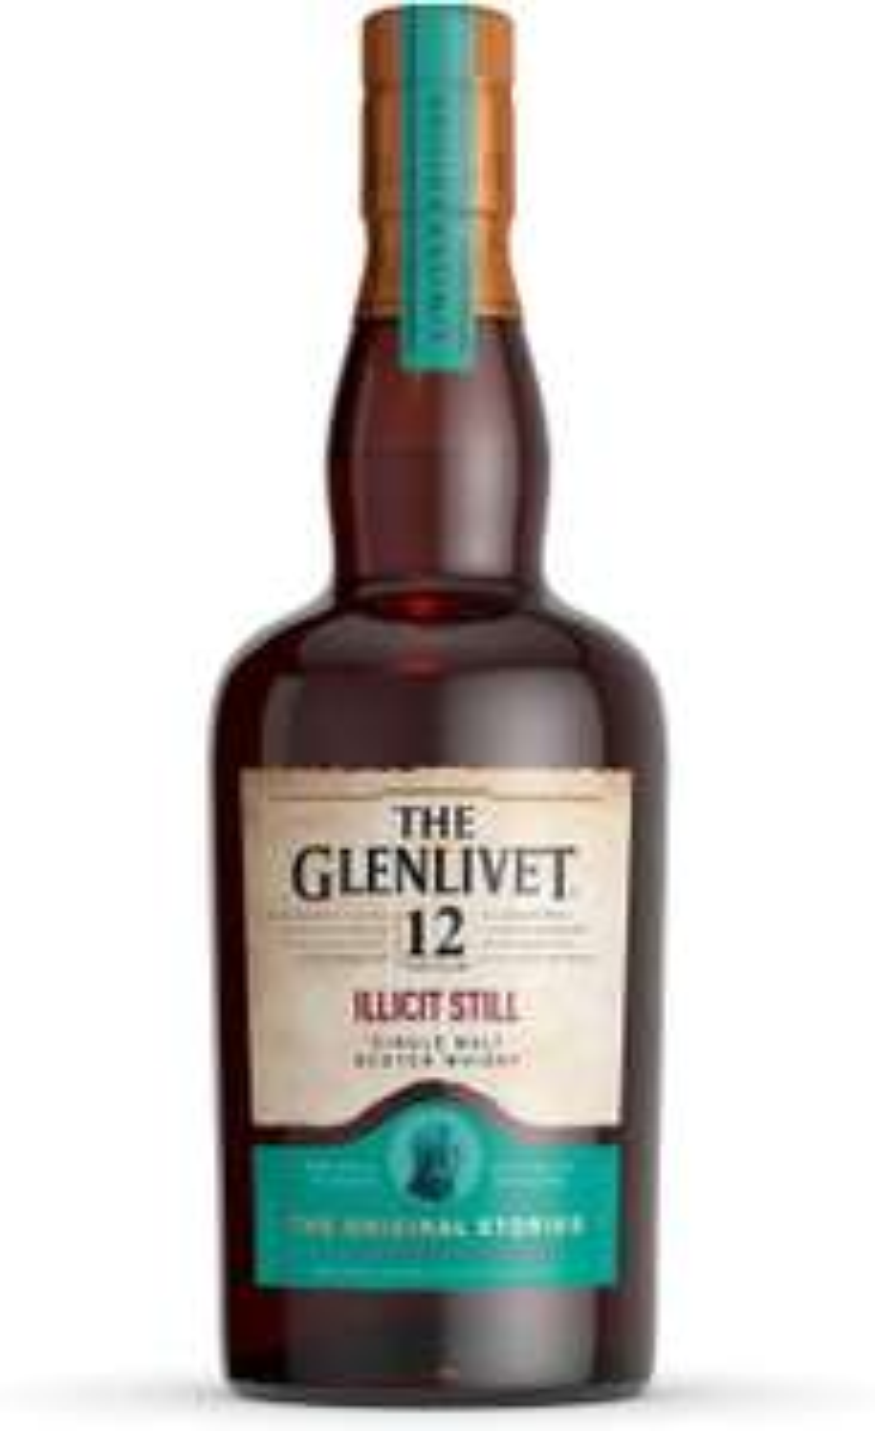 The Glenlivet 12 Jahre Illicit Still Single Malt Scotch Whisky bei DrankDozijn D12